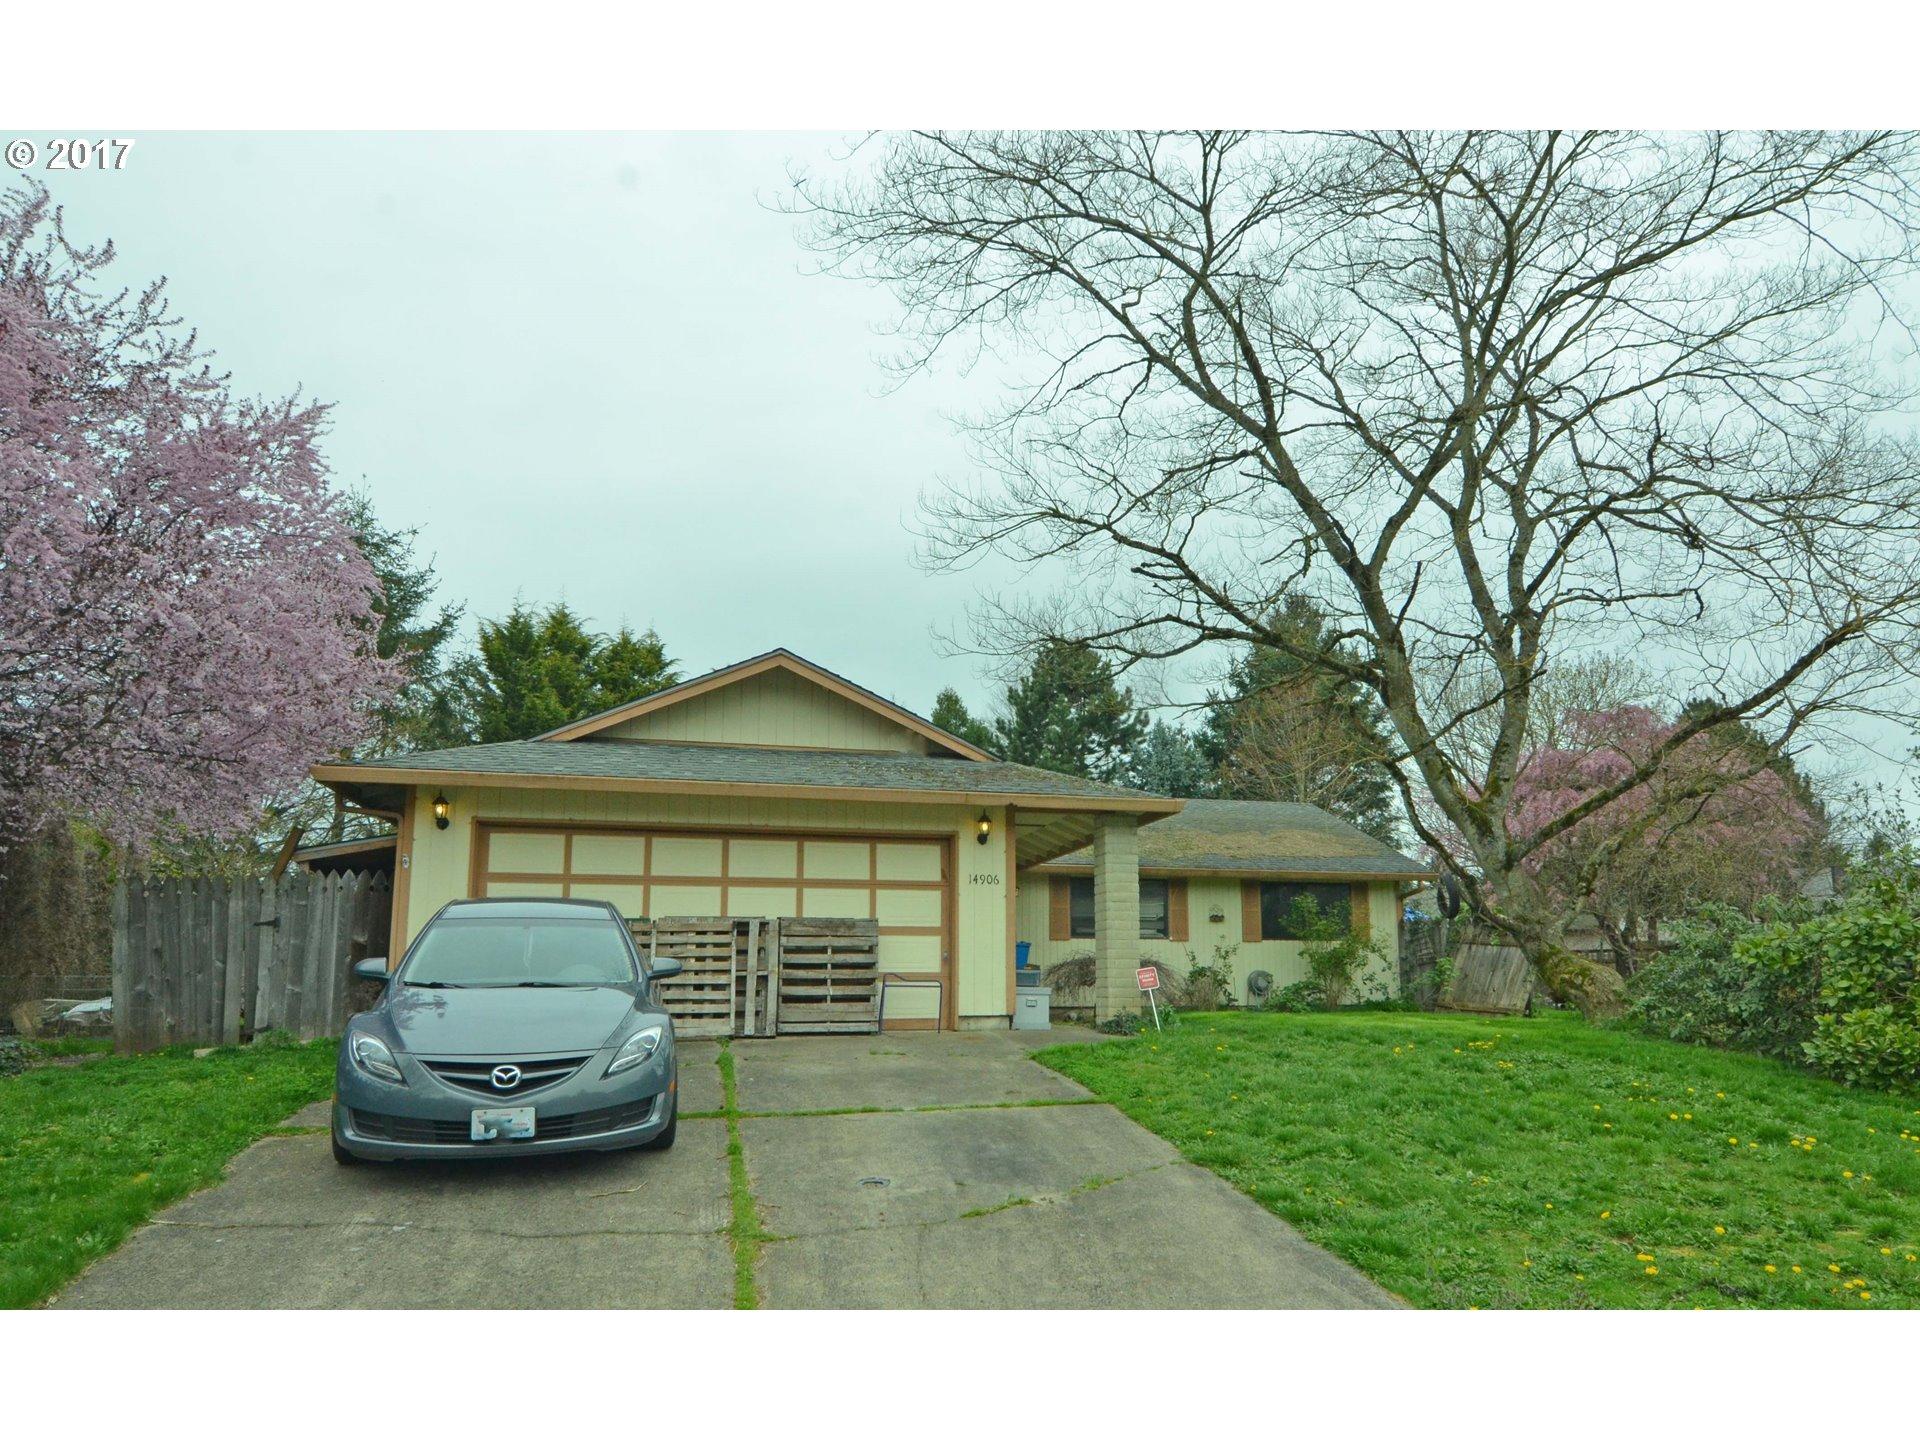 14906 NE COLUMBINE DR, Vancouver, WA 98682